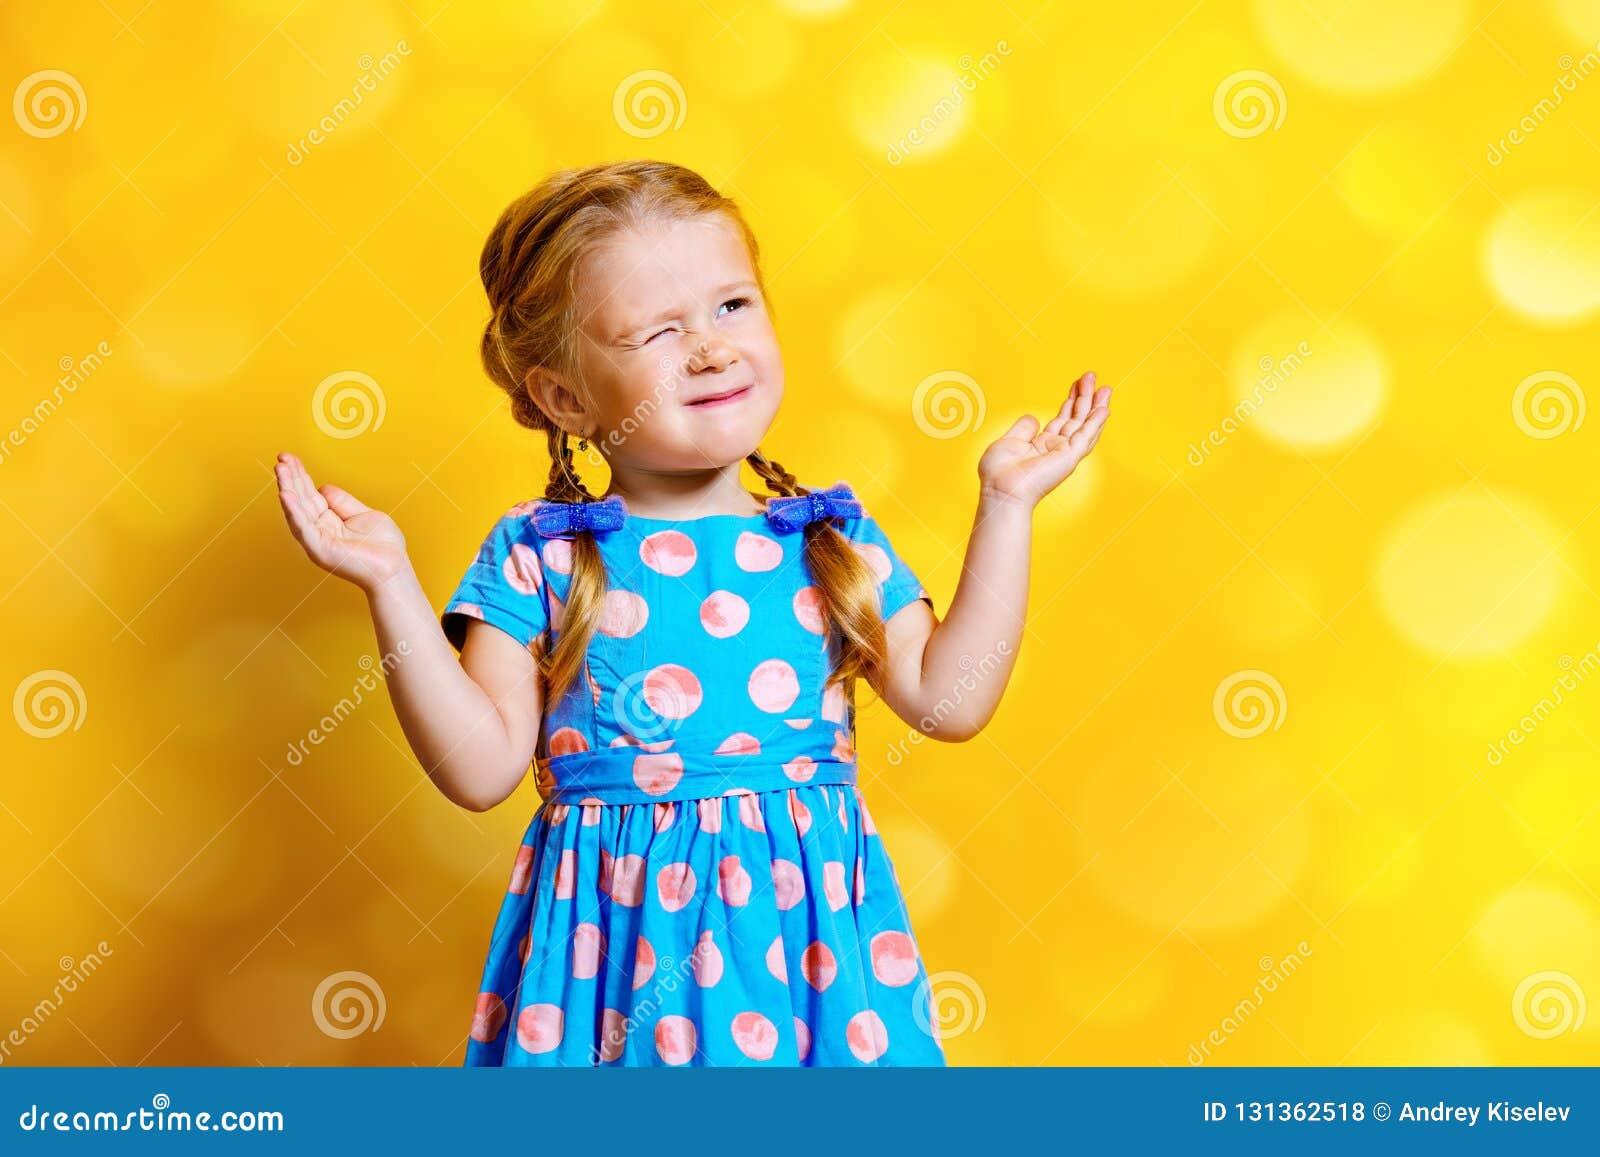 Pretty cheerful girl